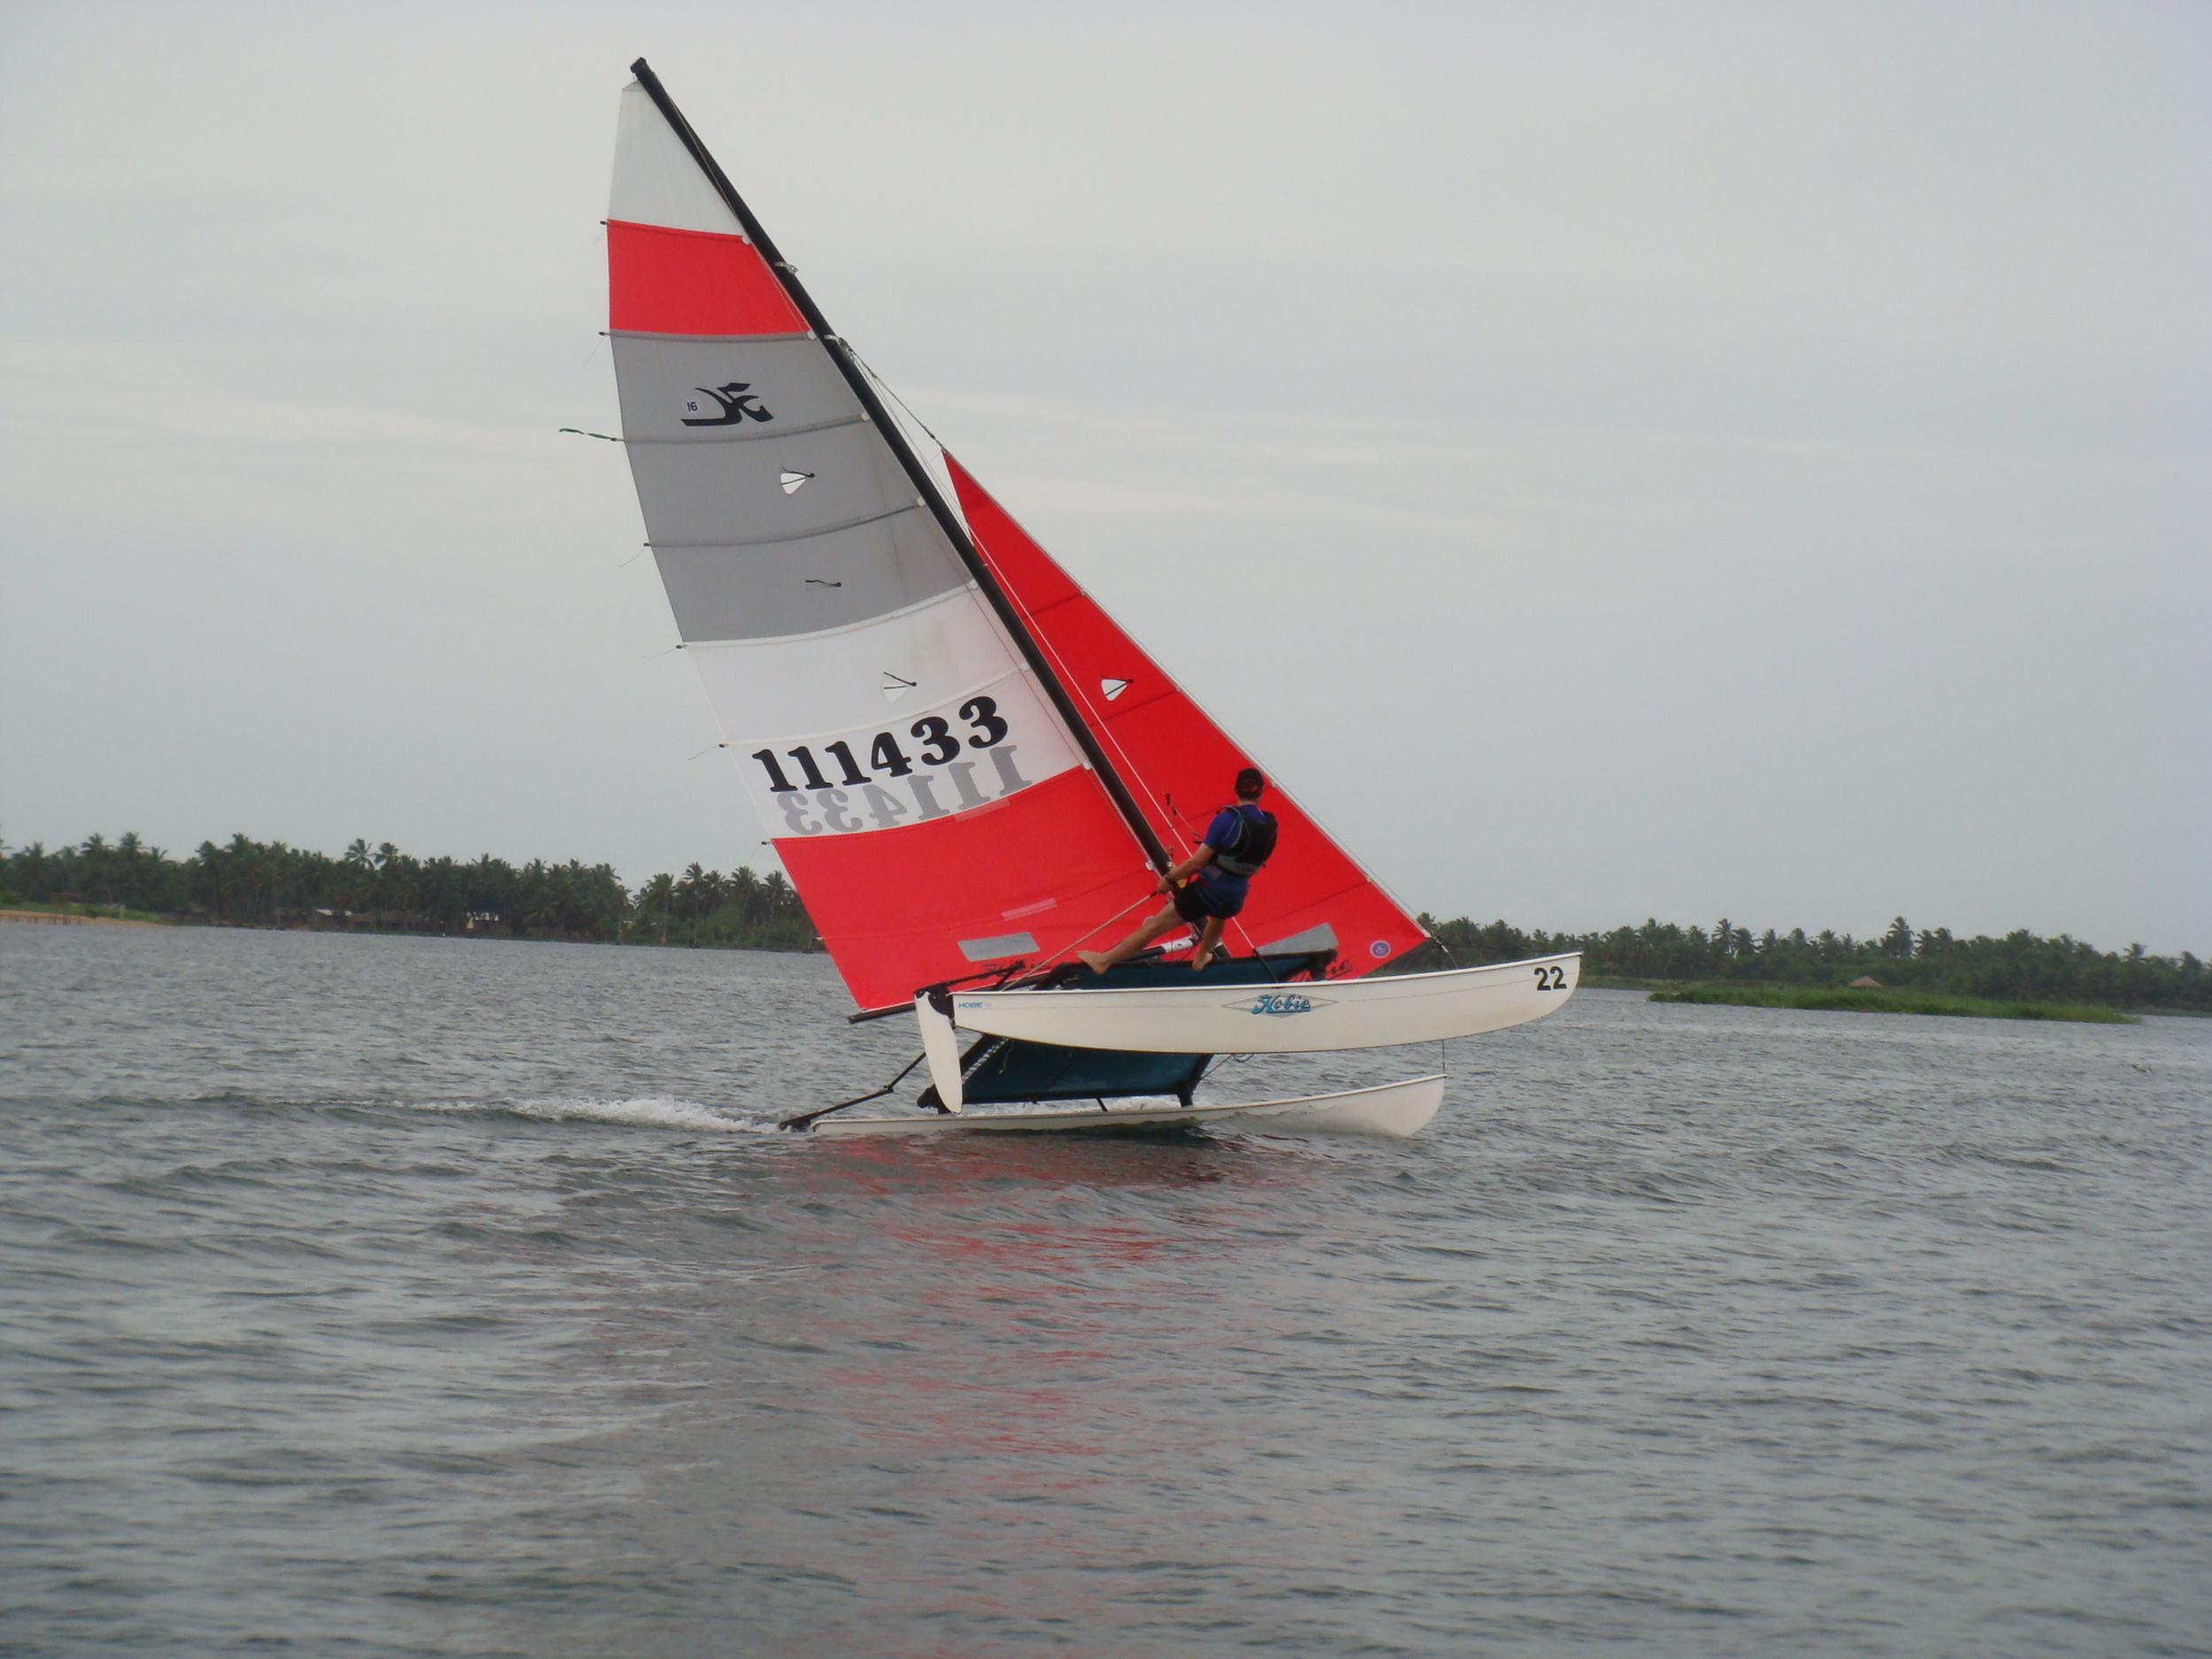 DSC01504.JPG